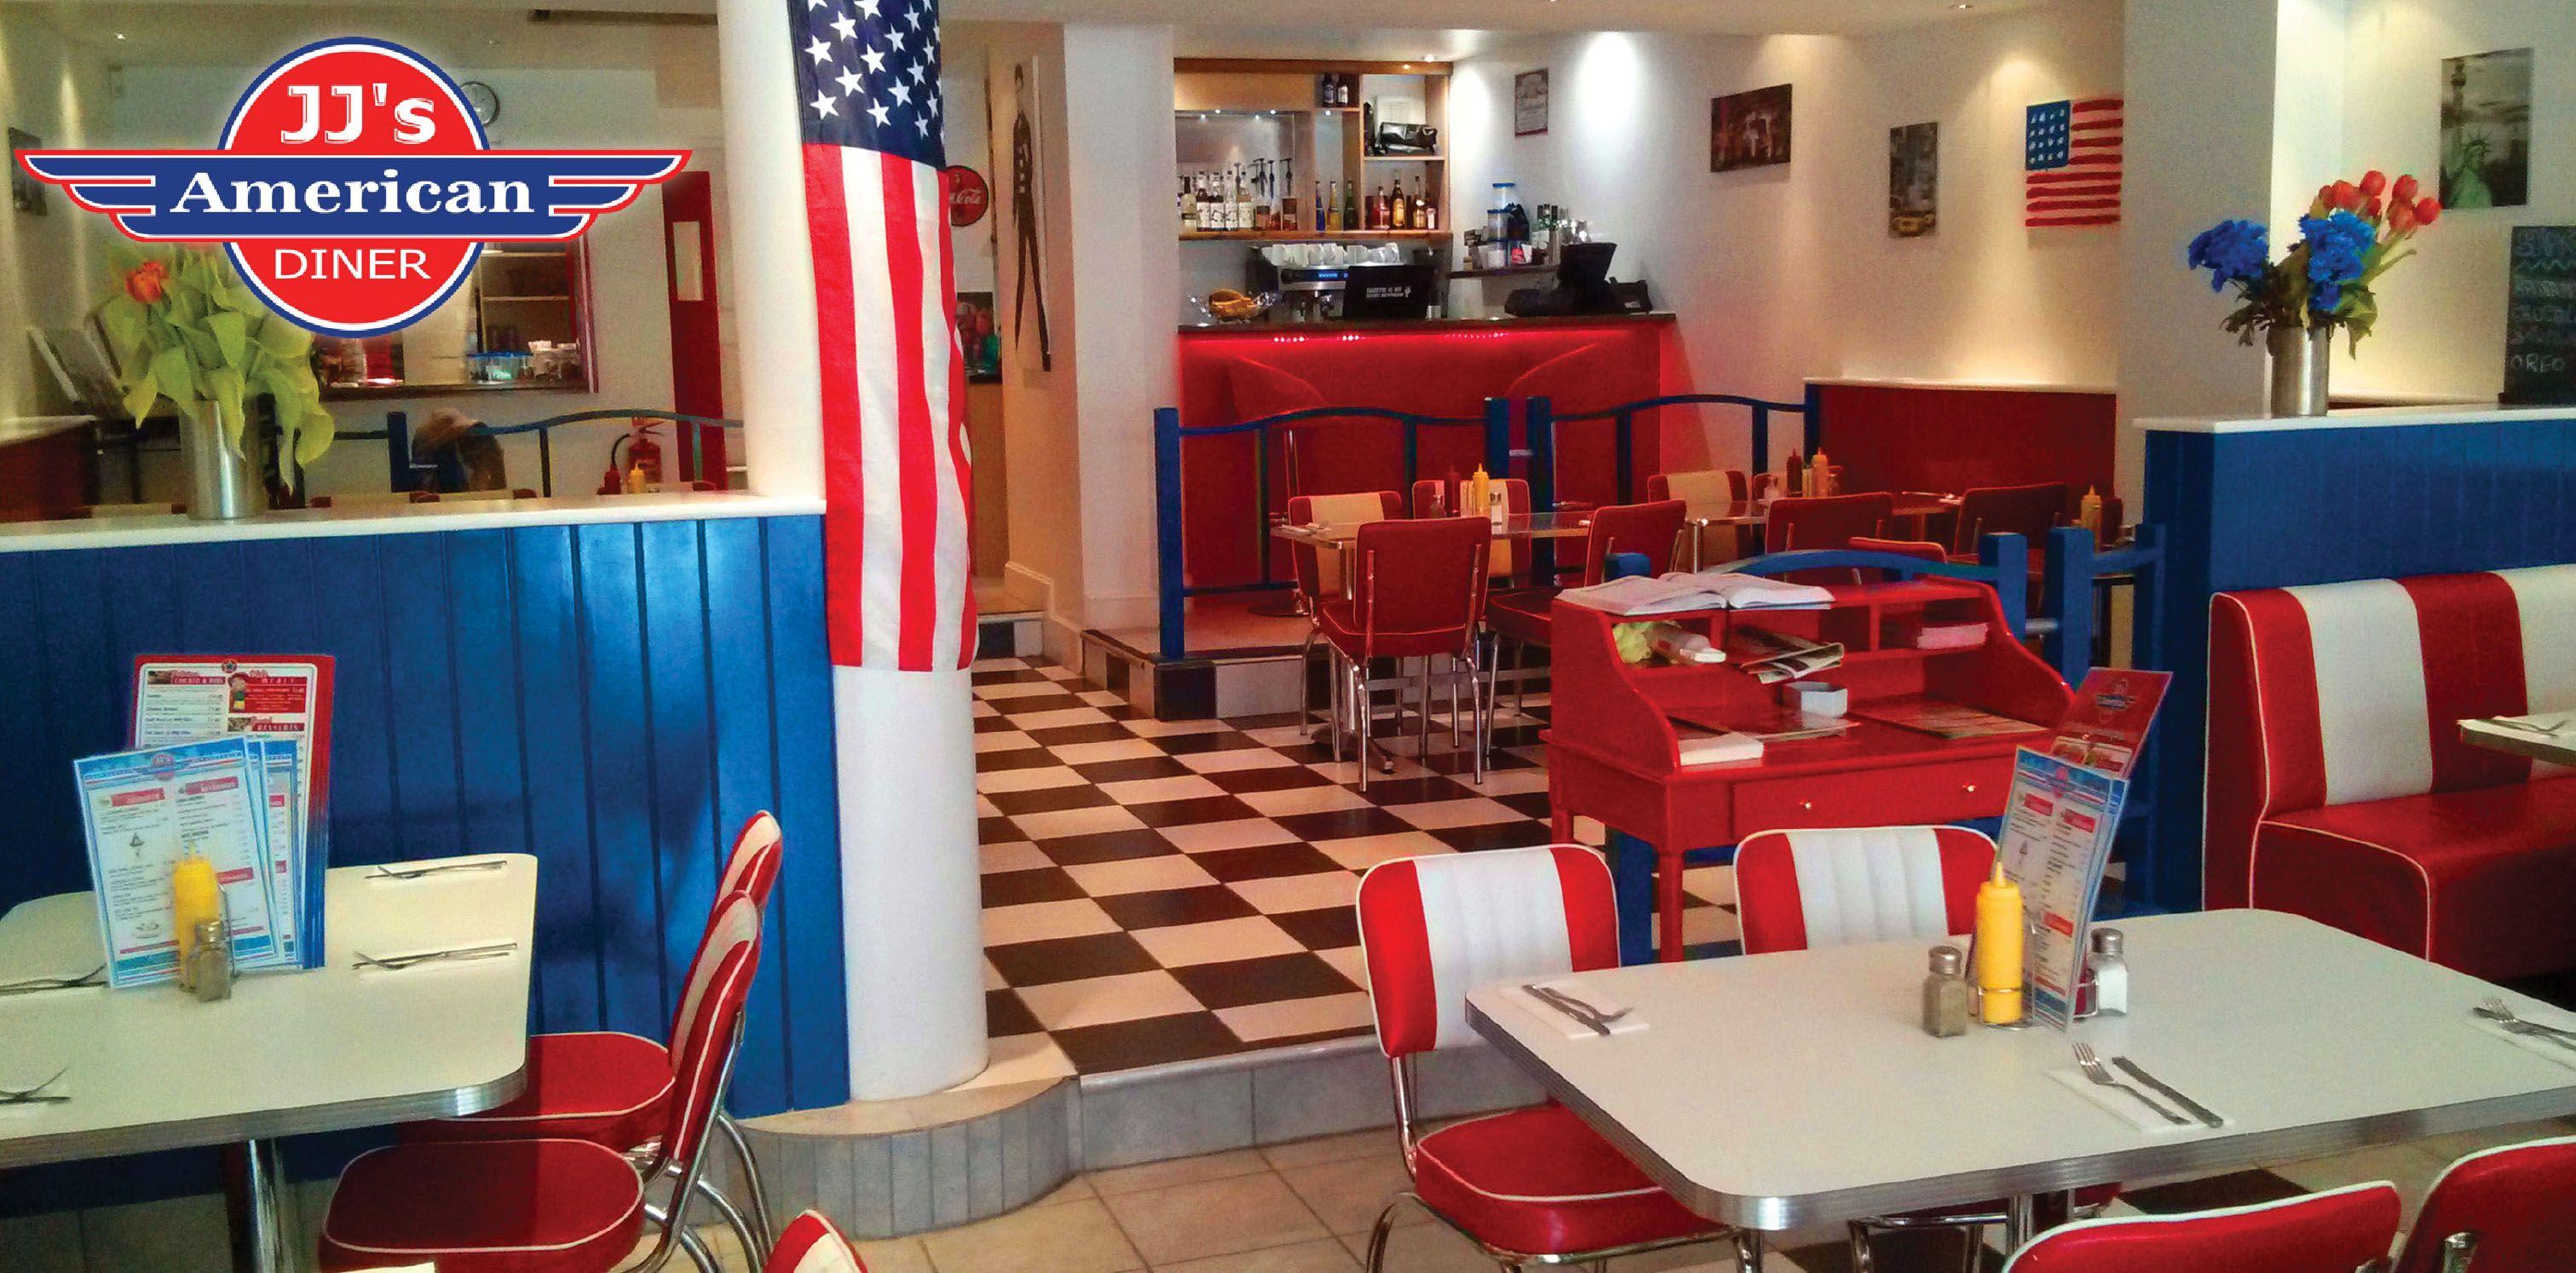 authentic fifties decor and diner restaurant - Recherche Google ...